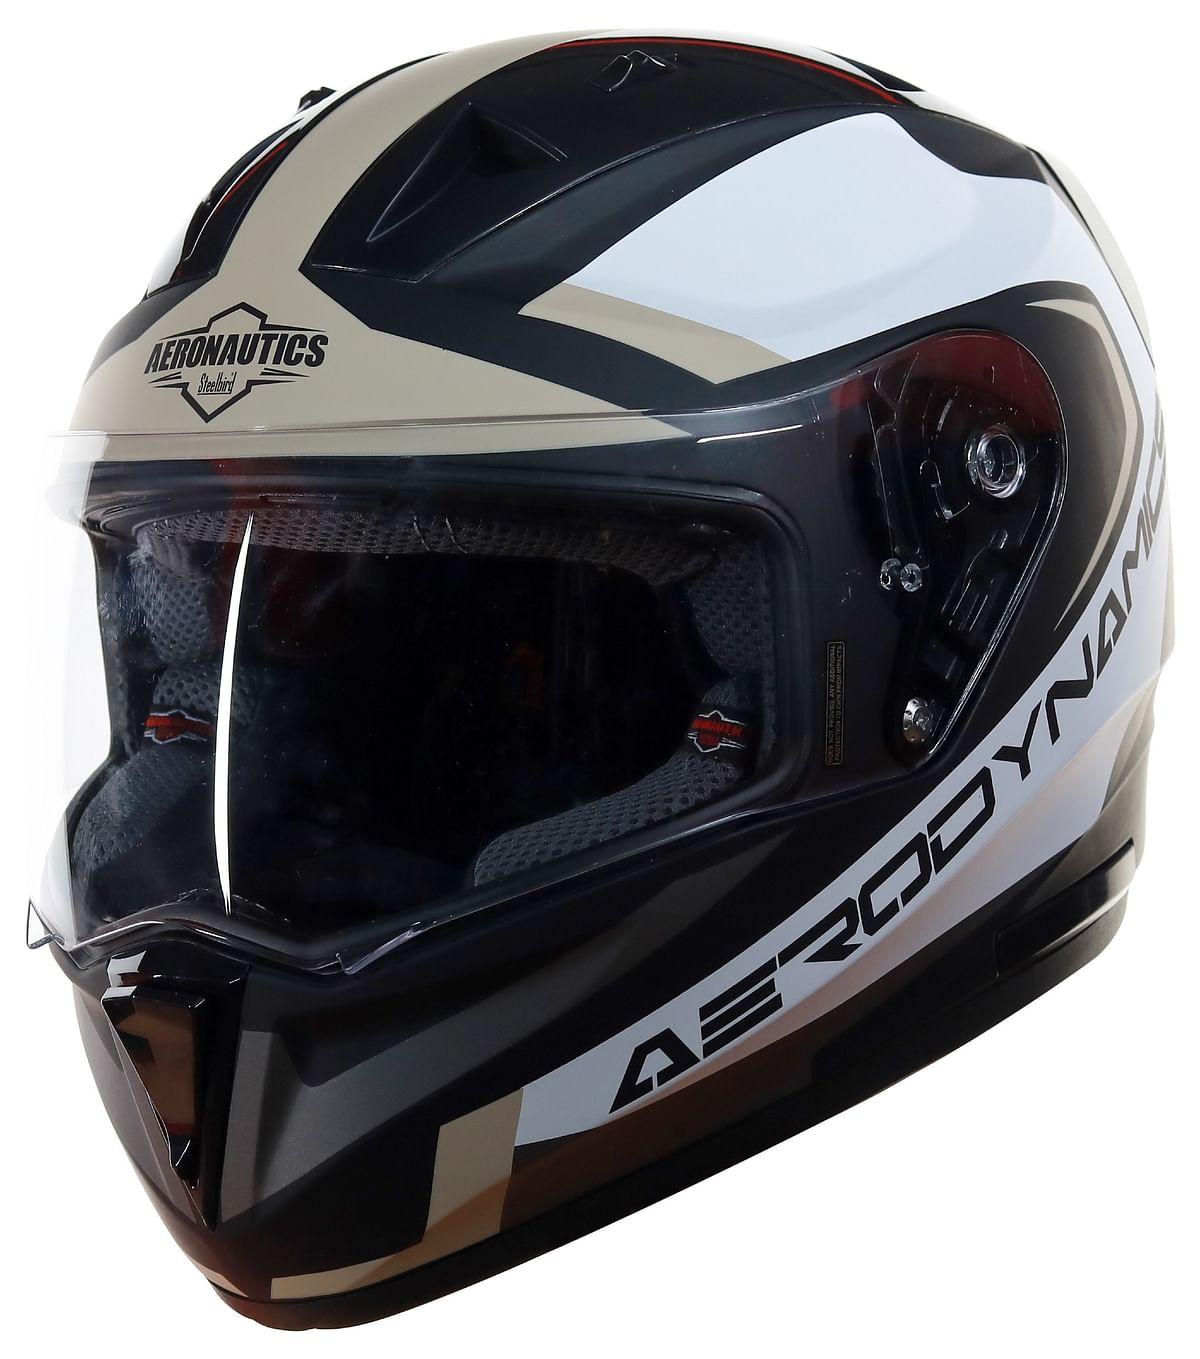 Steelbird is a well known ISI standard helmet